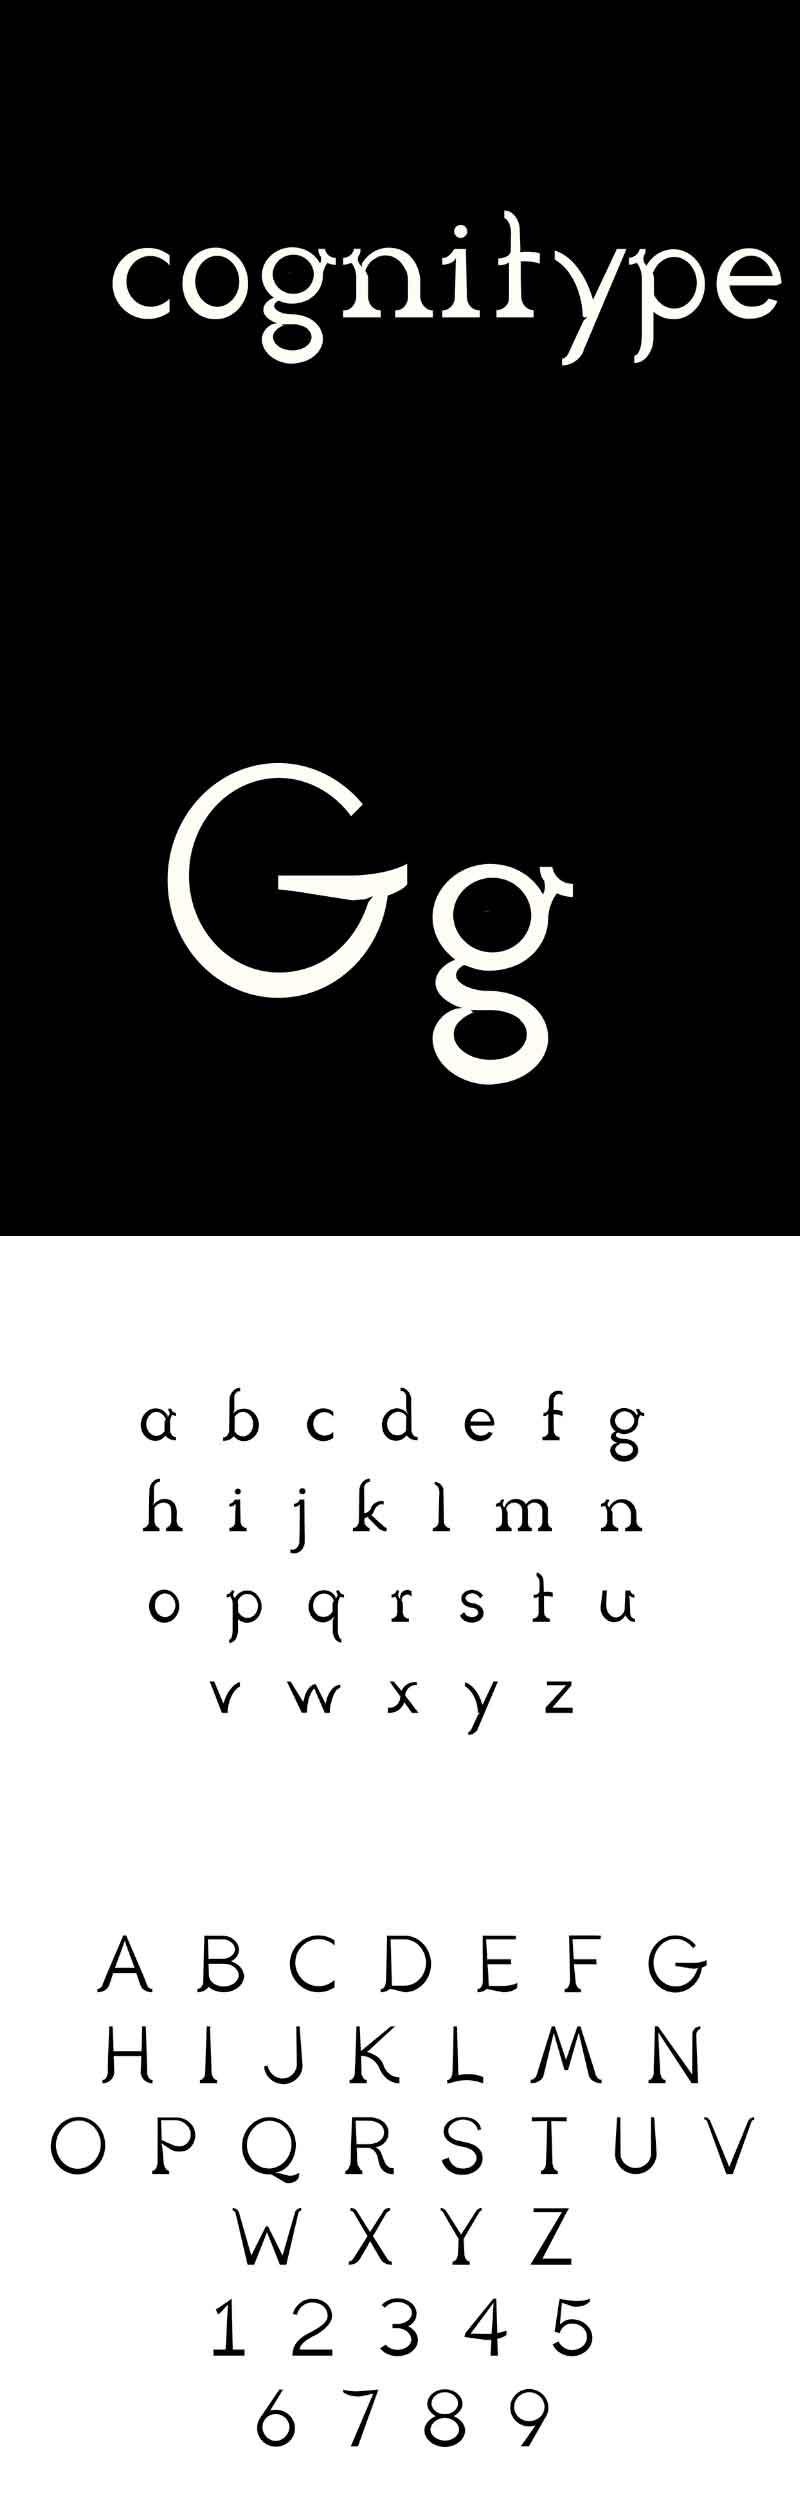 Cognitype-Serif-Free-Typeface